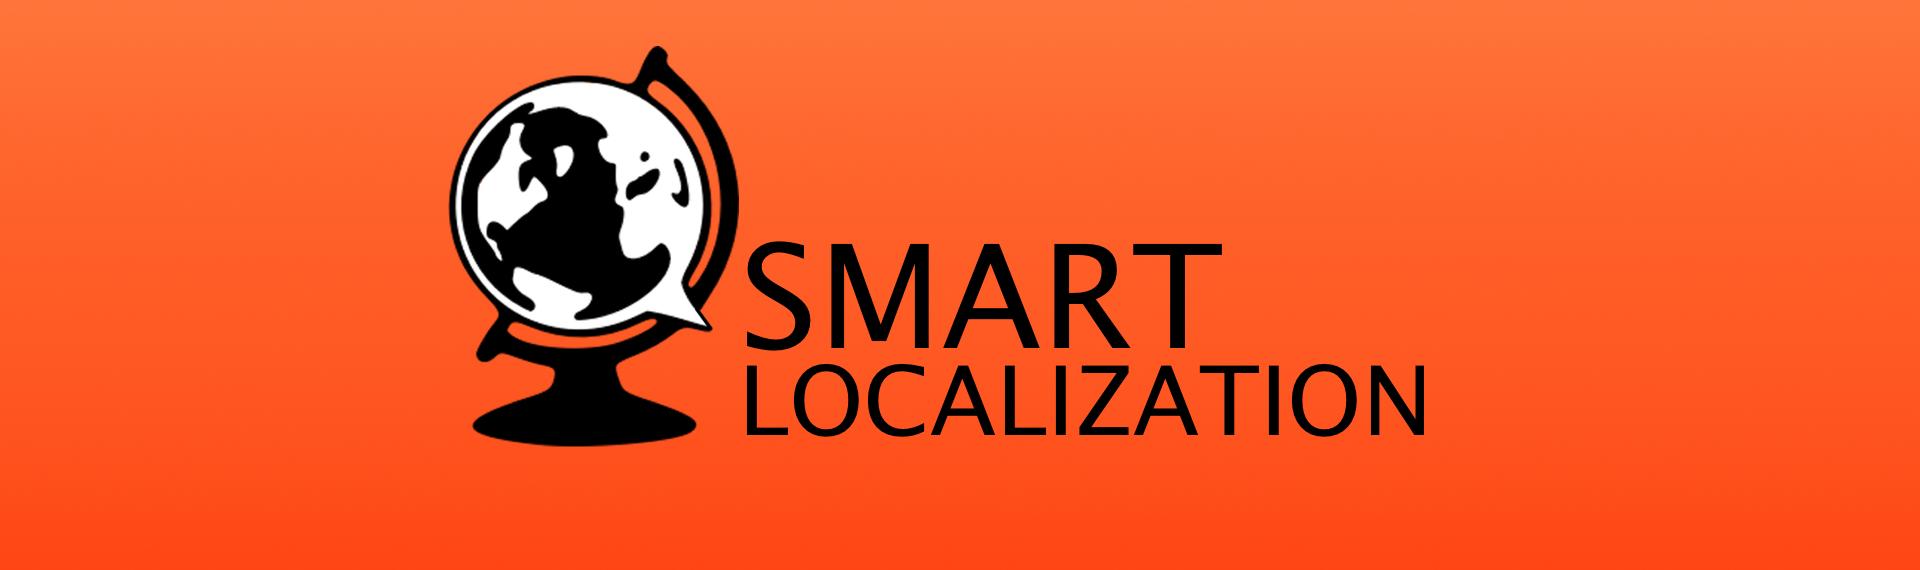 SmartLocalizationBanner.png